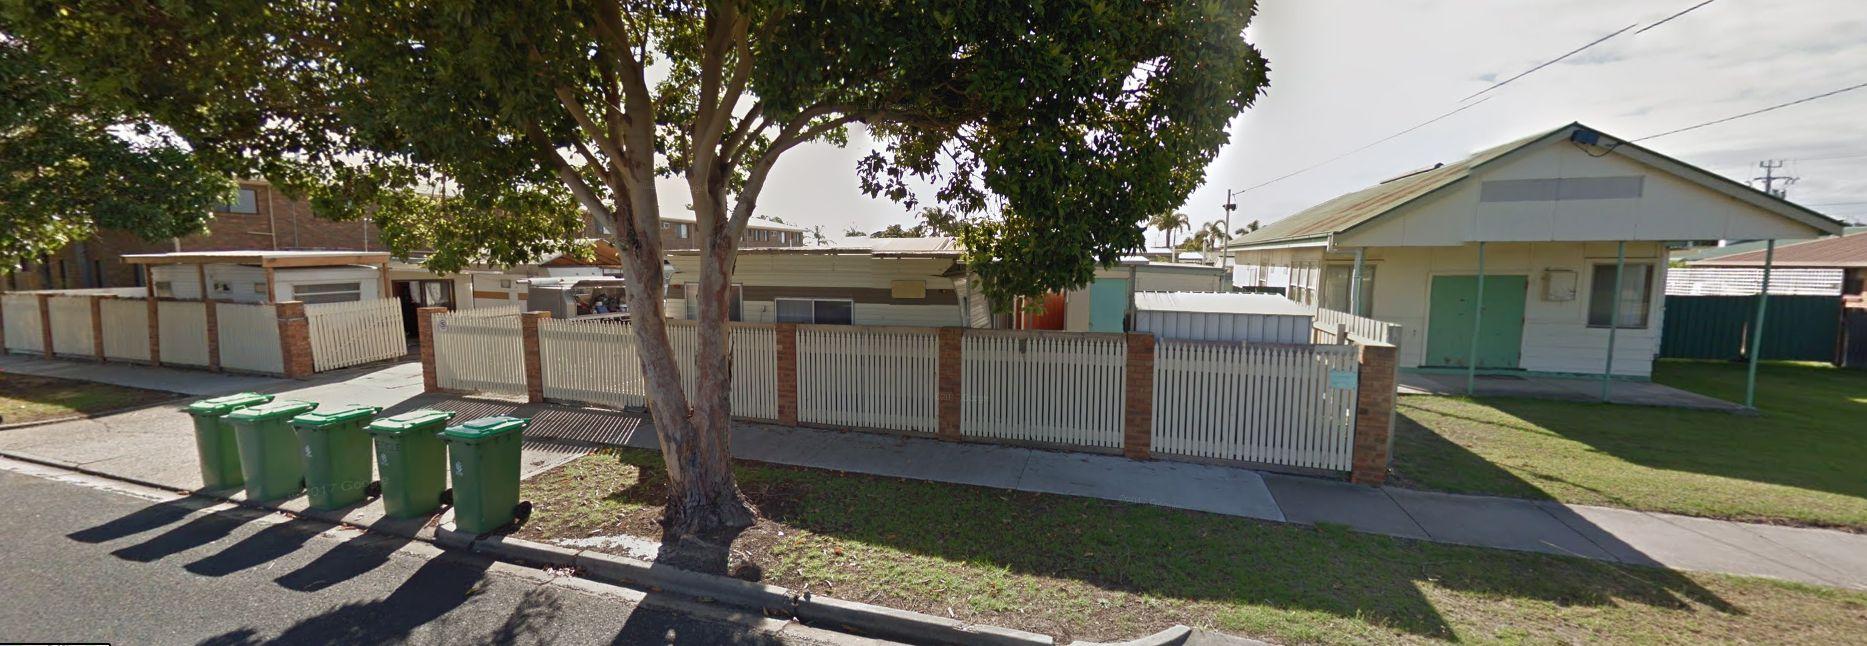 57 Church Street, Lakes Entrance VIC 3909, Image 2